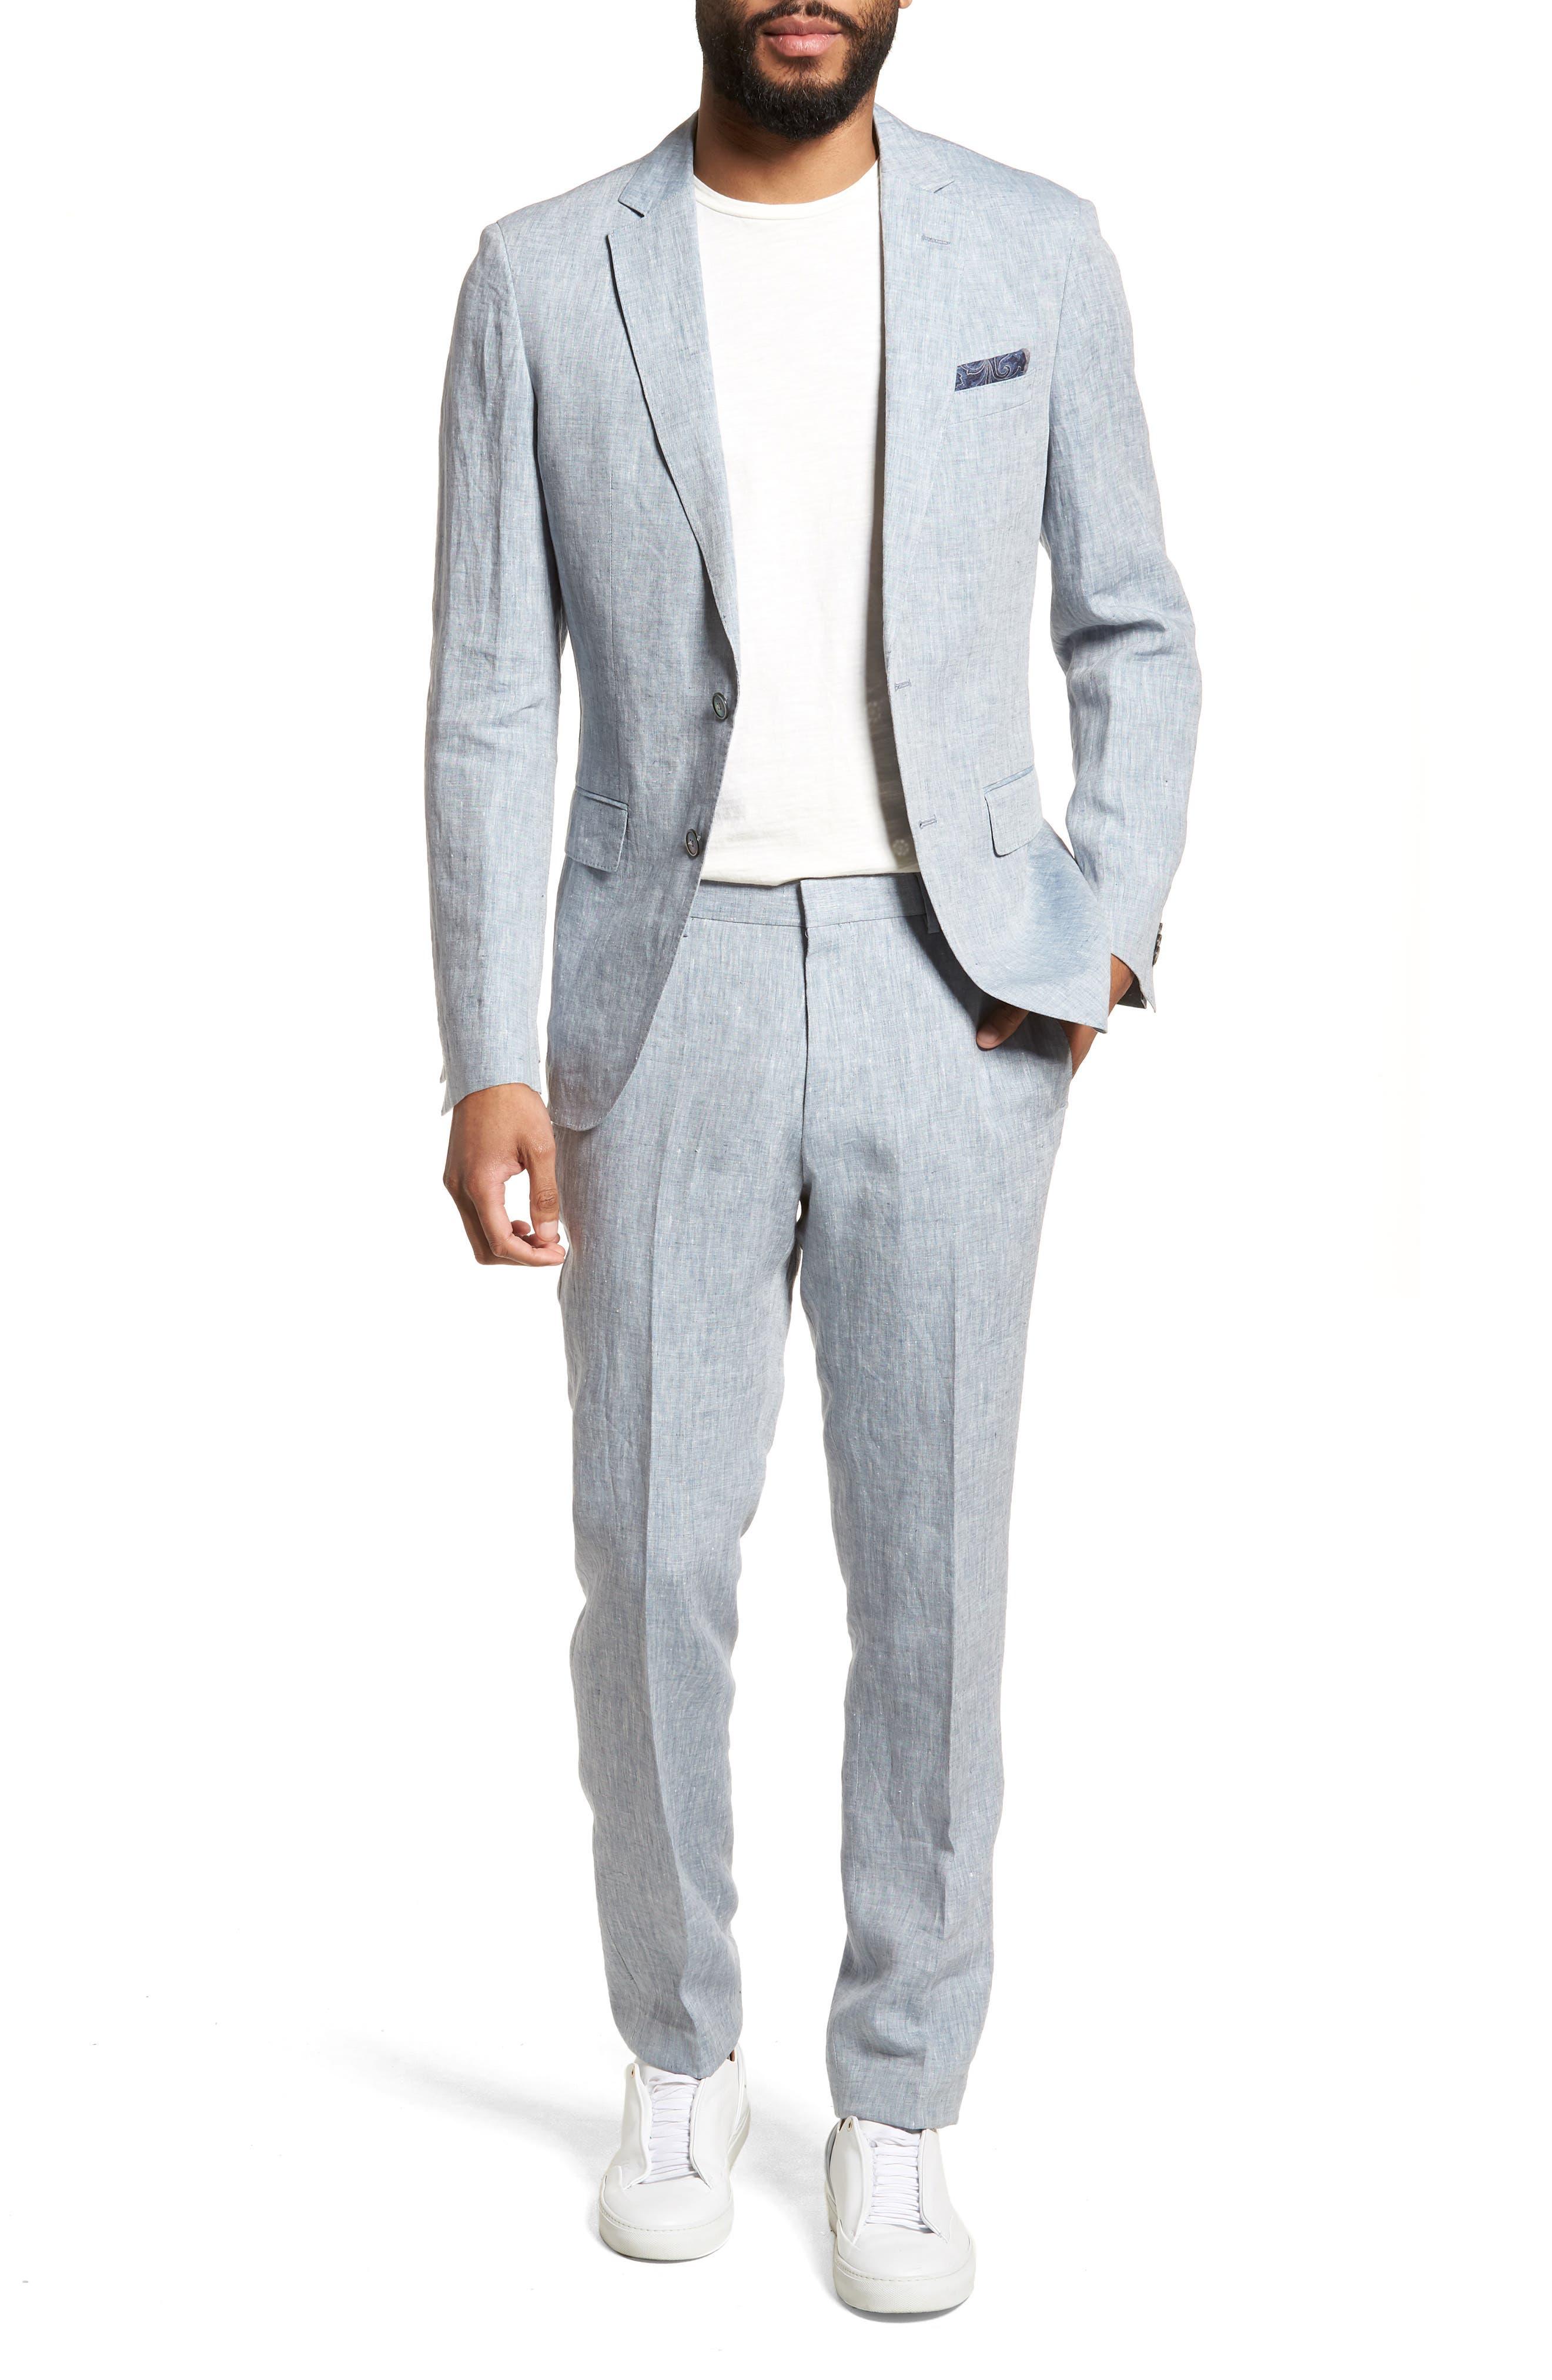 Helford/Gander Trim Fit Solid Linen Suit,                             Main thumbnail 1, color,                             Light Blue